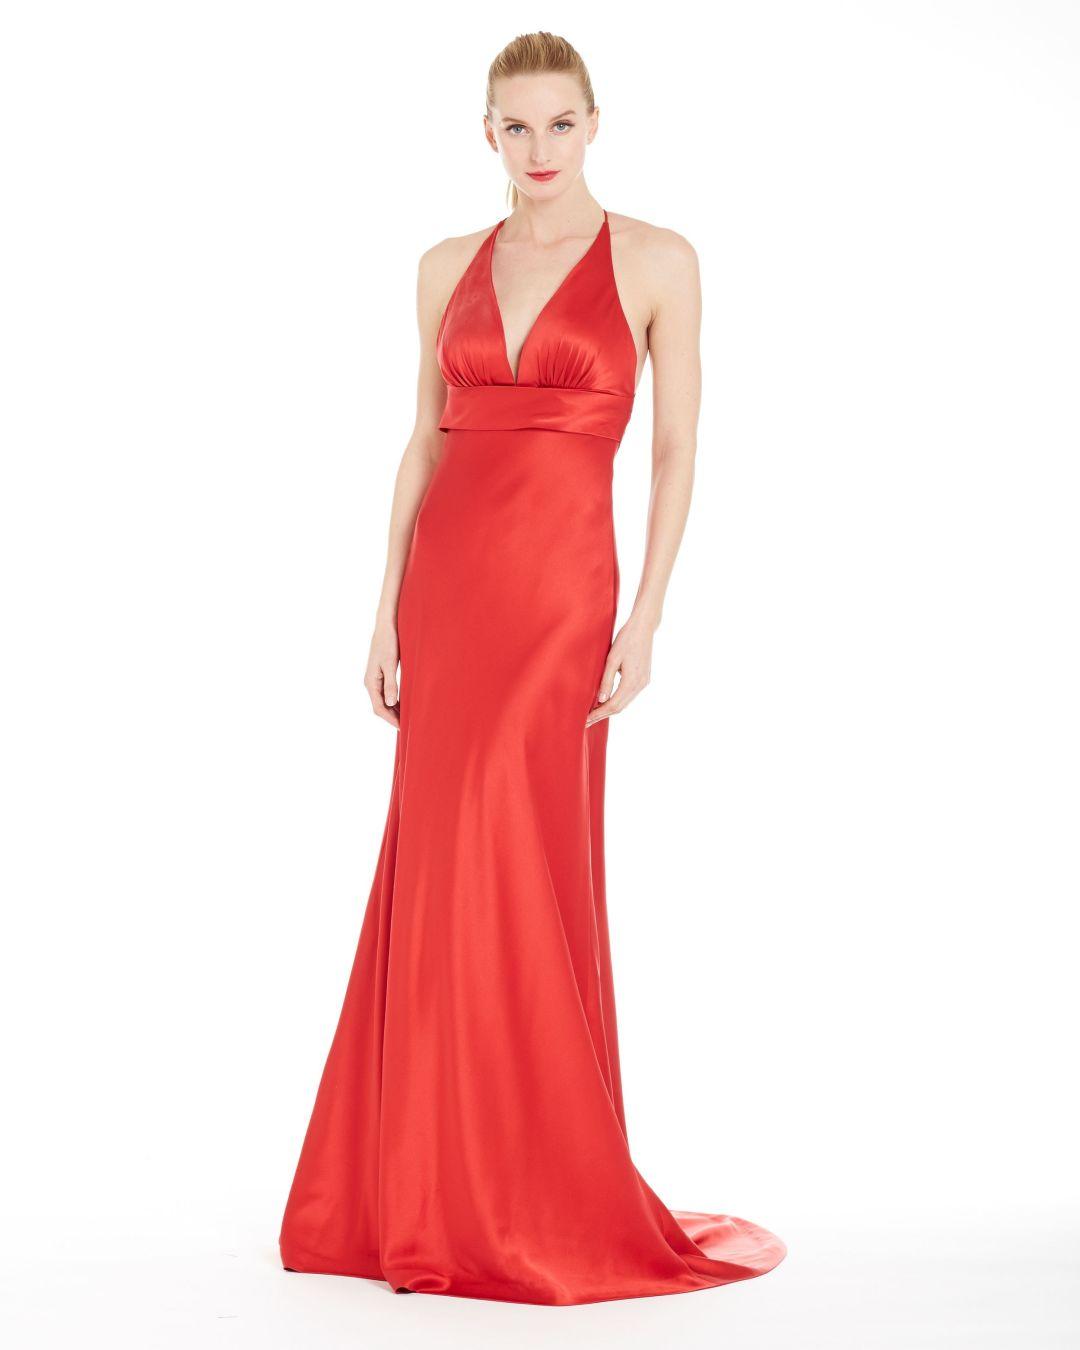 Lypl liquid luly yang ruby silk charmeuse spaghetti strap gown front 1 rvewm7